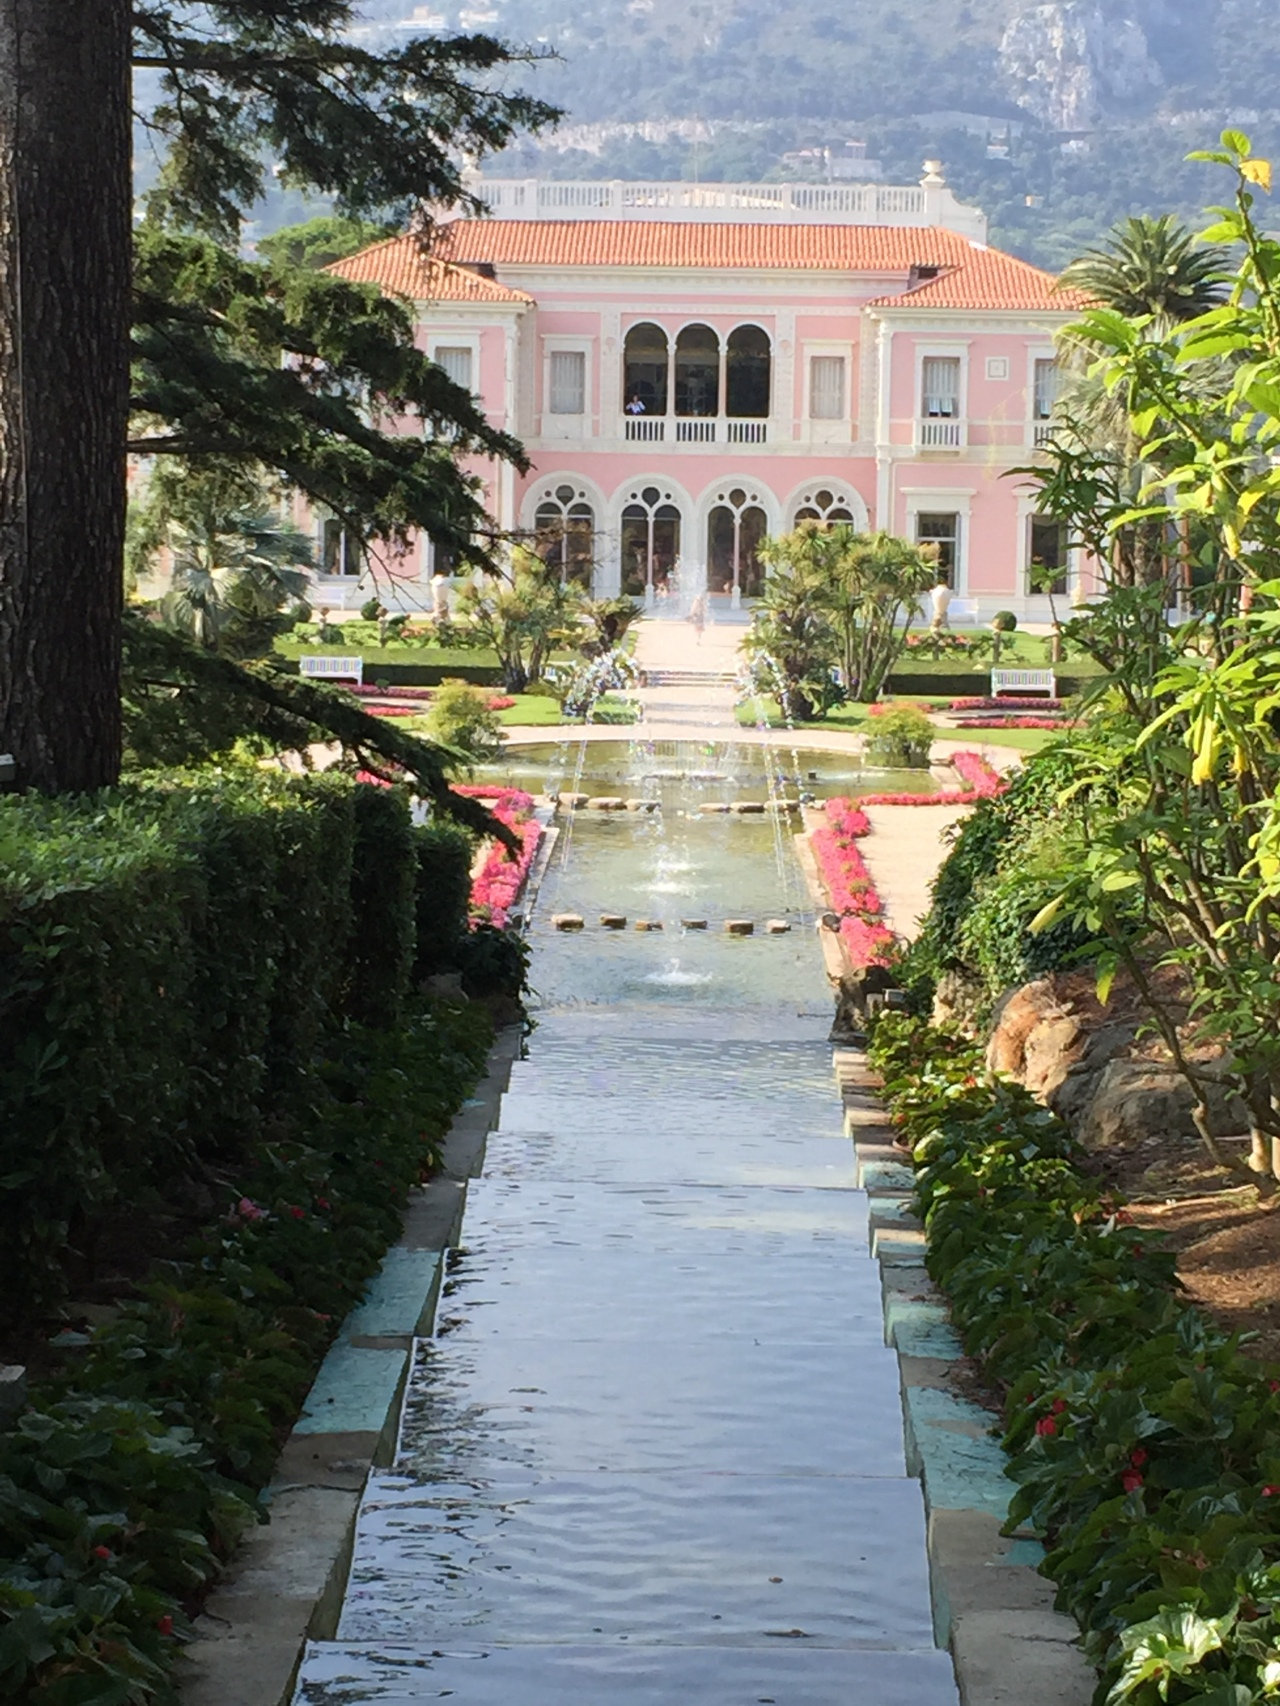 Villa Kerylos and Villa et Jardins Ephrussi deRothschild